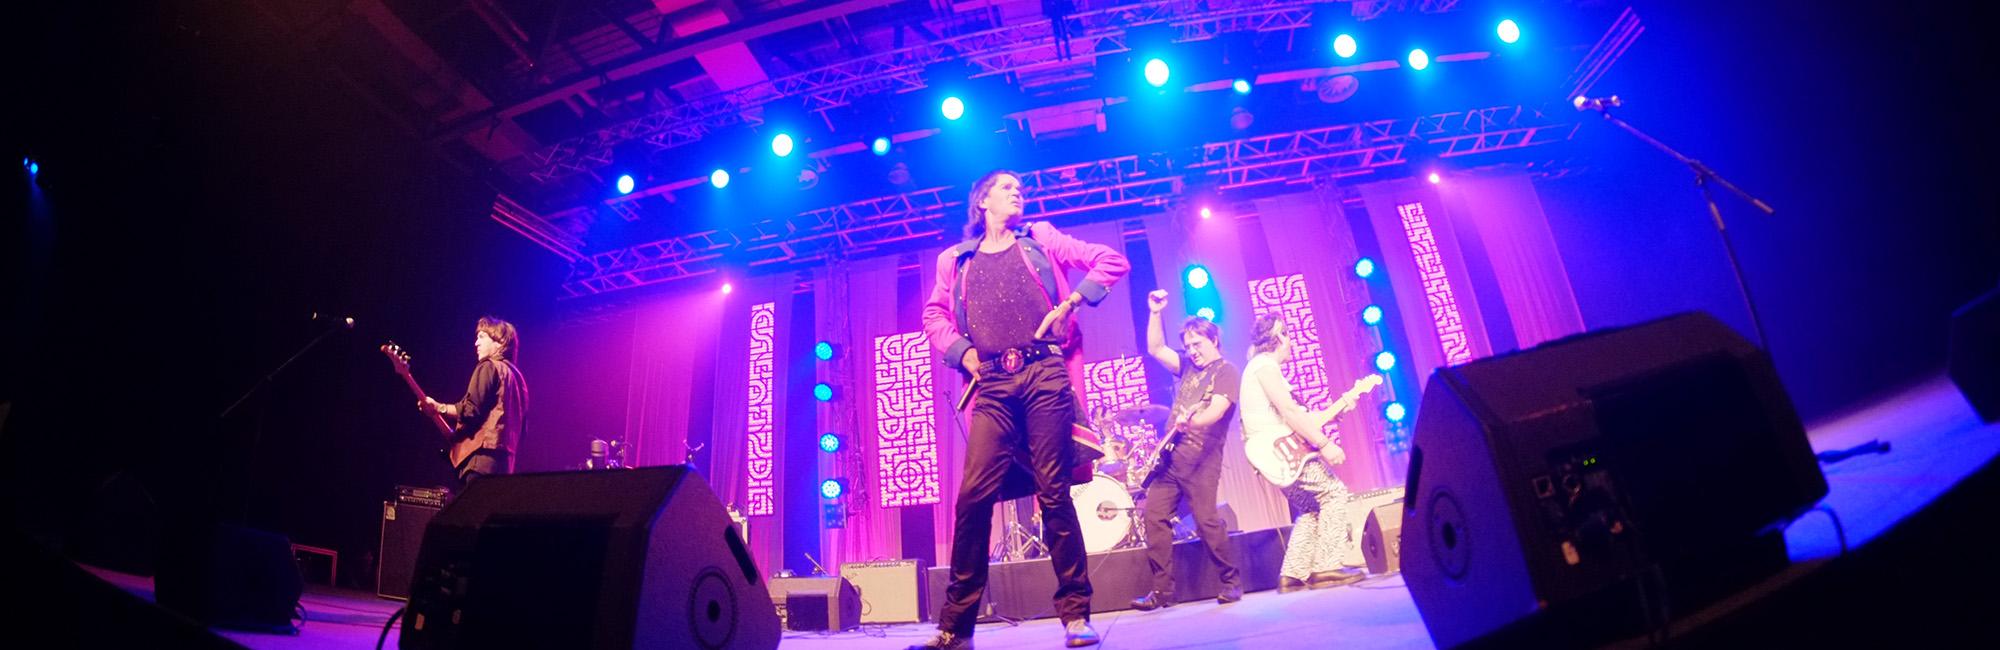 Jumping Jack Flash, Rolling Stones Tribute Band Perth Australia